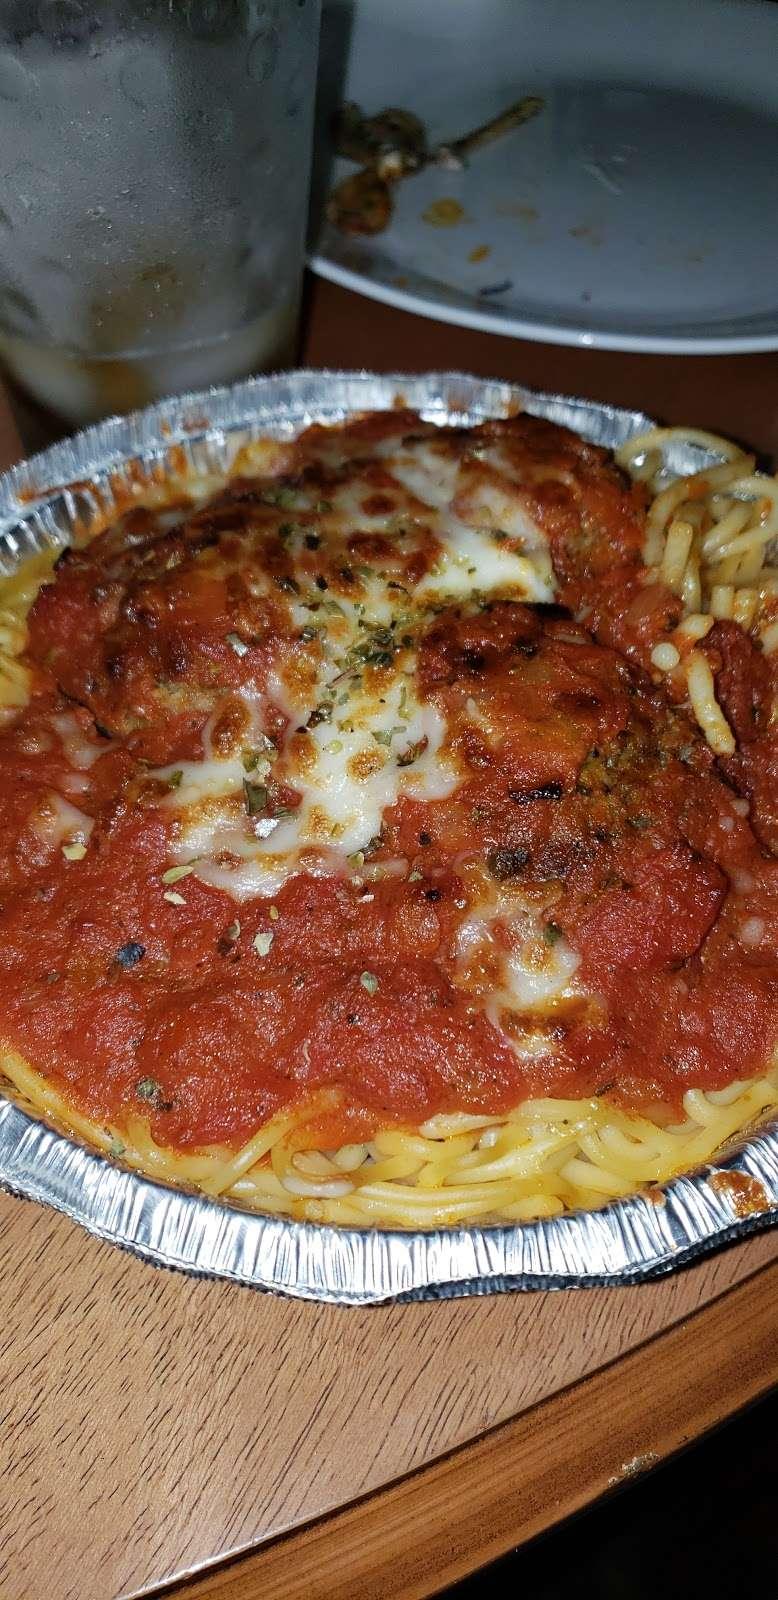 Romas Pizza - restaurant    Photo 8 of 10   Address: 617 N Redondo Dr # B, Oceanside, CA 92057, USA   Phone: (760) 757-2003